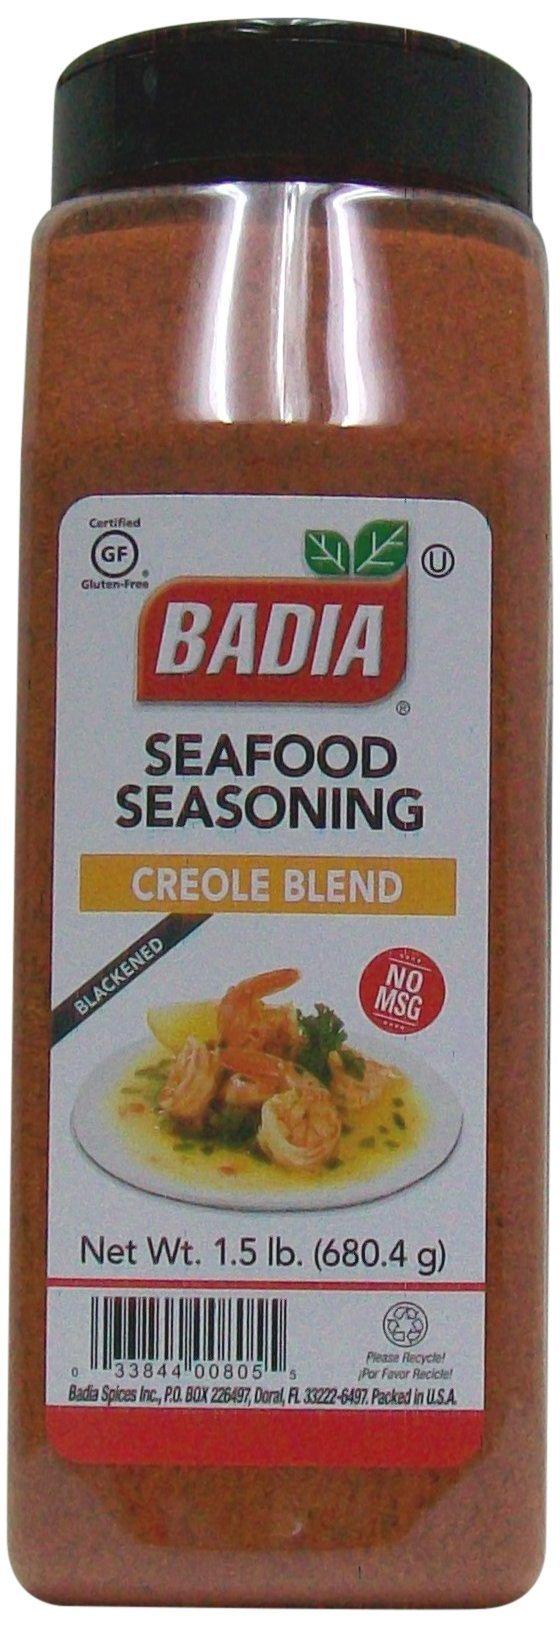 Badia Seafood Seasoning Creole Blend(Blackened),1.5 Pound (Pack of 6) by Badia